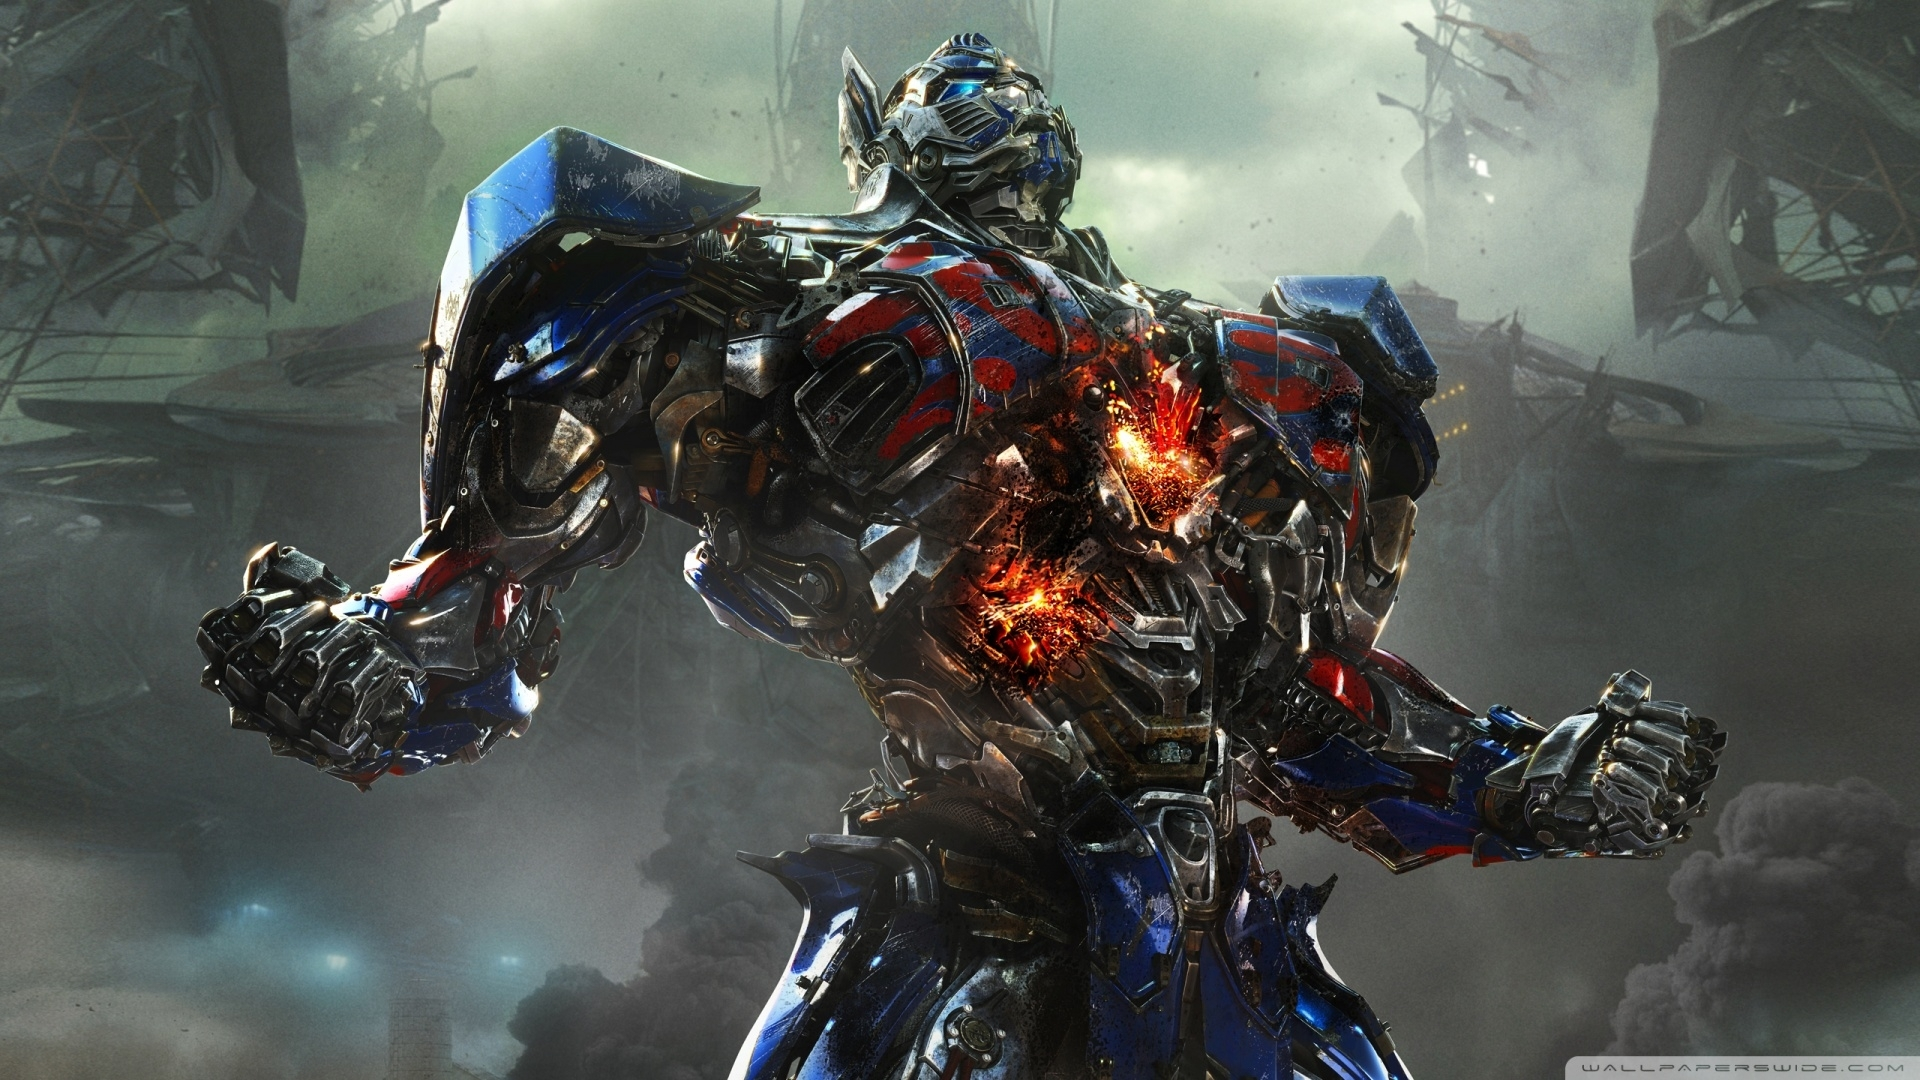 transformers 4 optimus prime ❤ 4k hd desktop wallpaper for 4k ultra